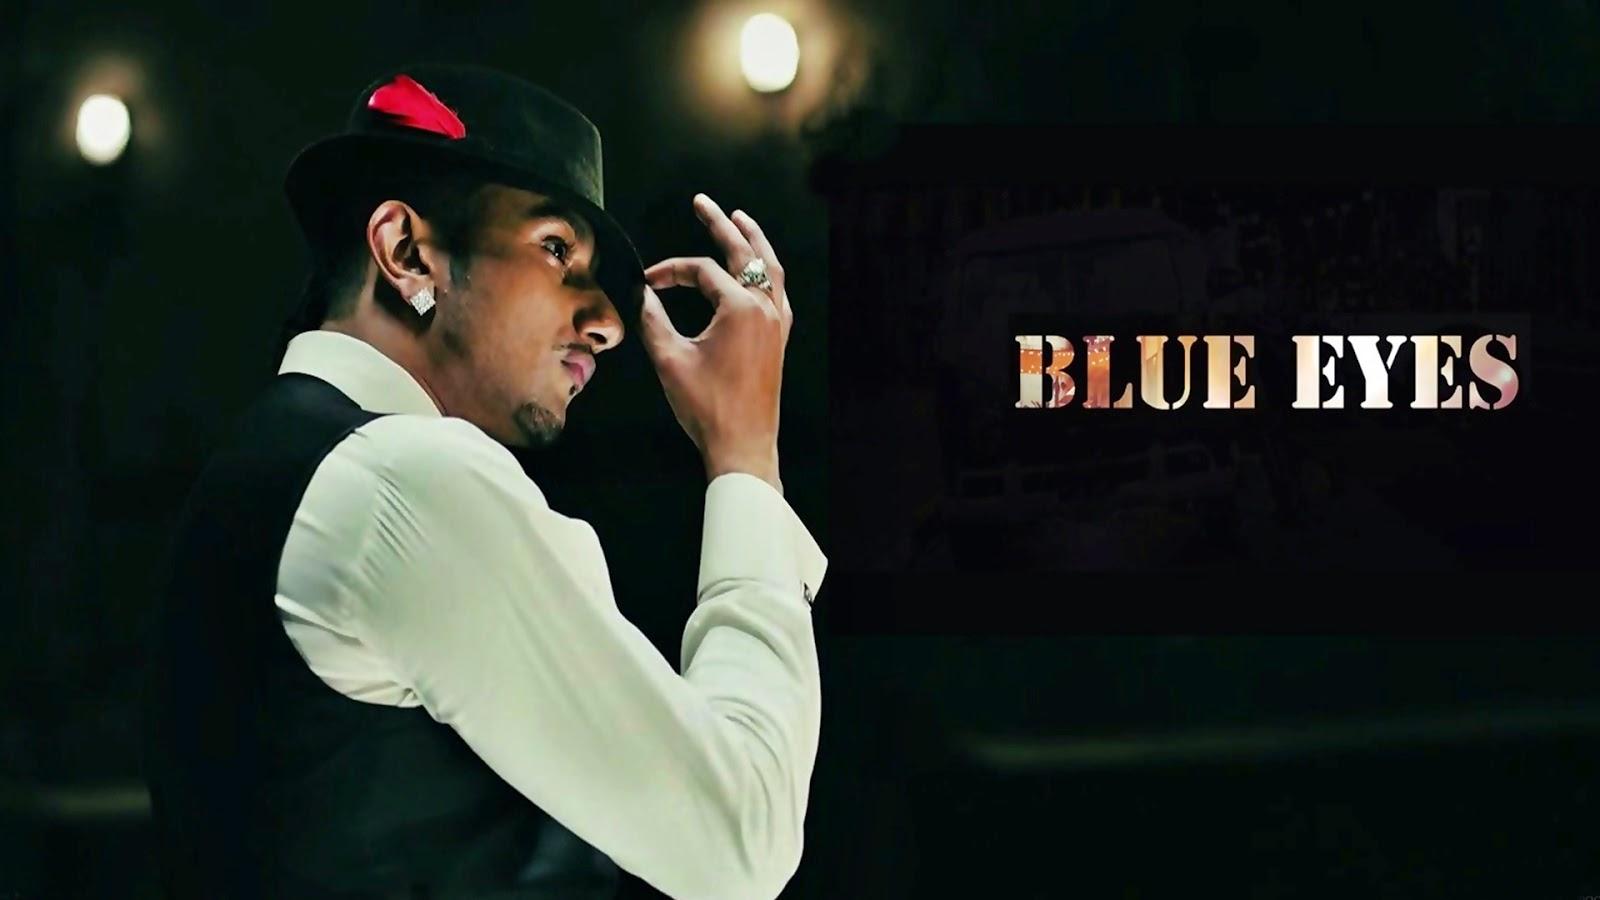 Hindi Movie Songs Lyrics: Blue Eyes Lyrics